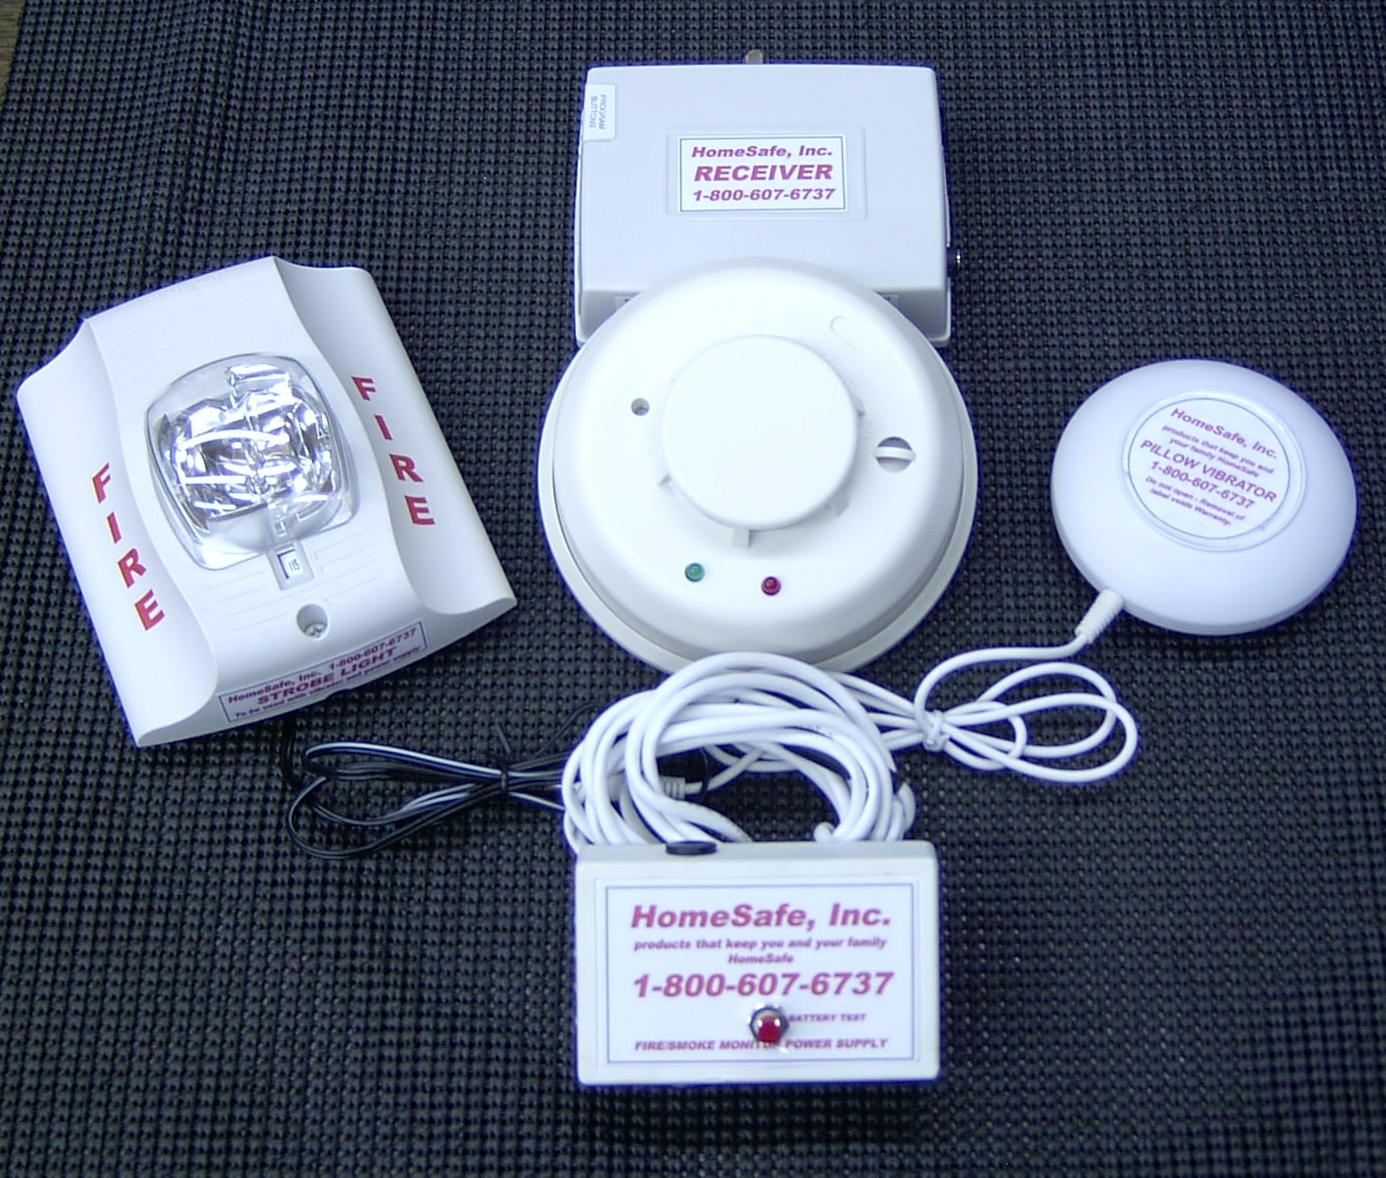 public weather alert radios hearing vision impaired accessory kit pellet stoves noaa radios. Black Bedroom Furniture Sets. Home Design Ideas